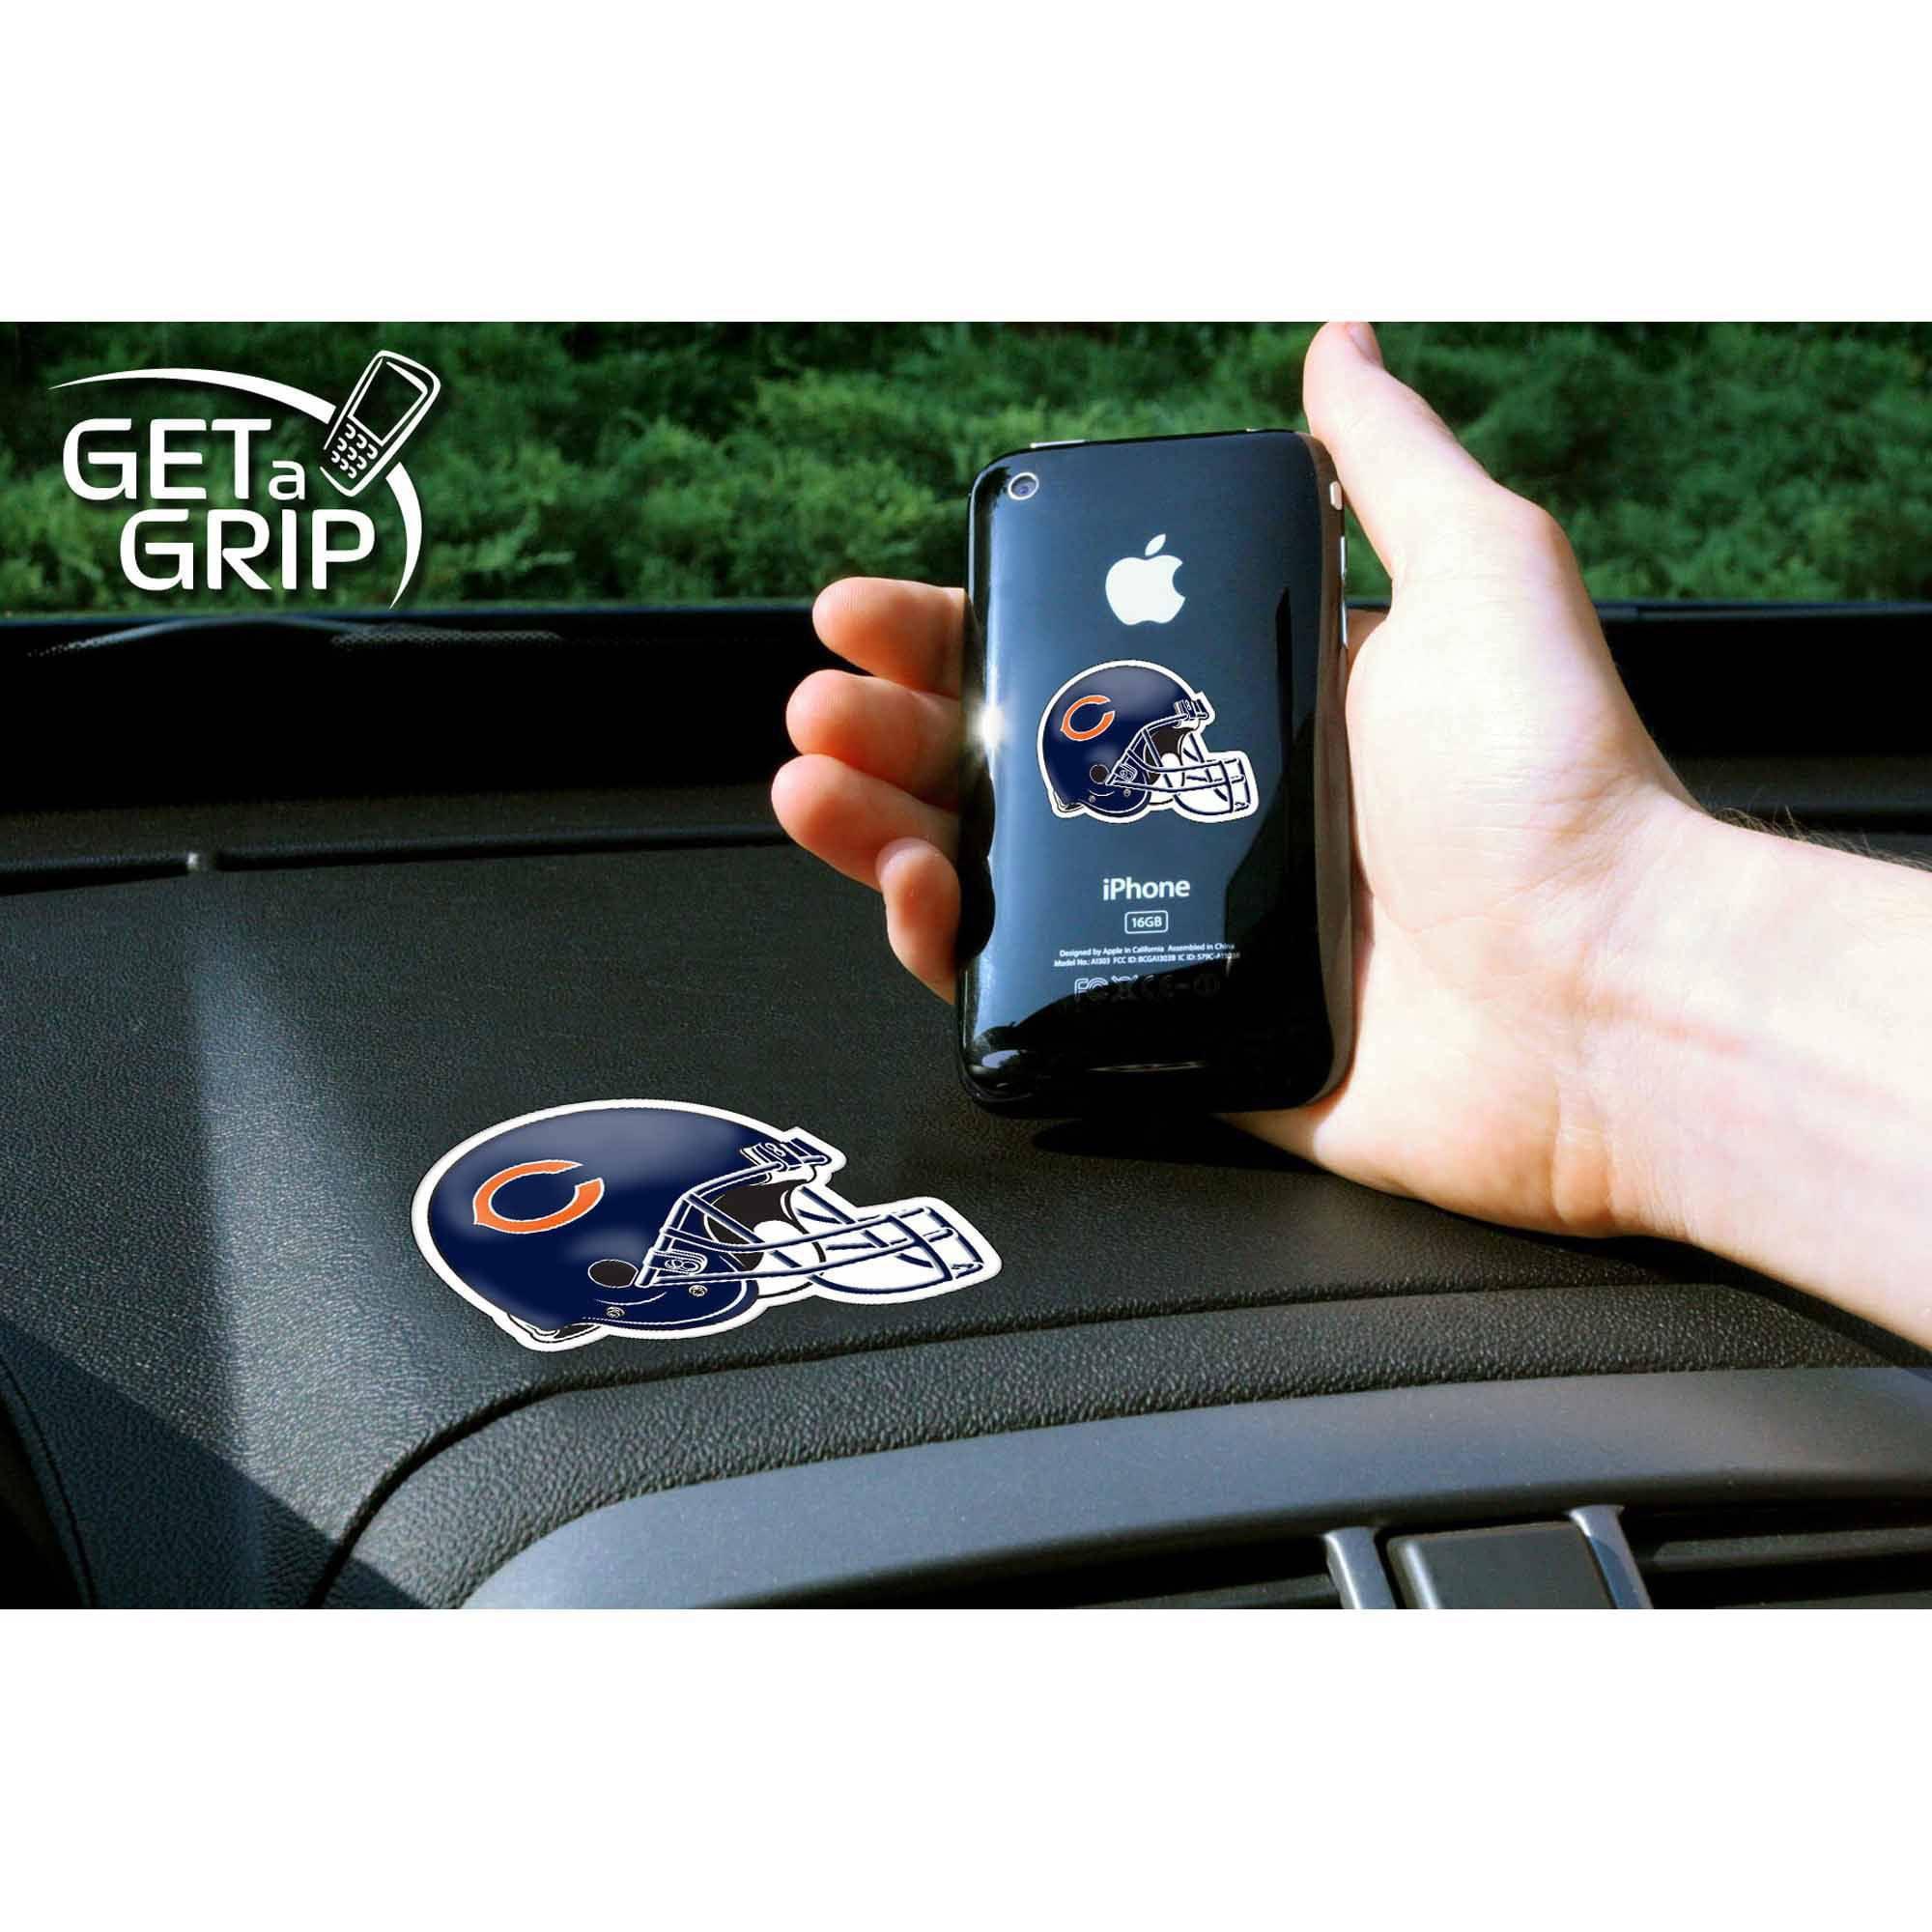 NFL Chicago Bears Get a Grip